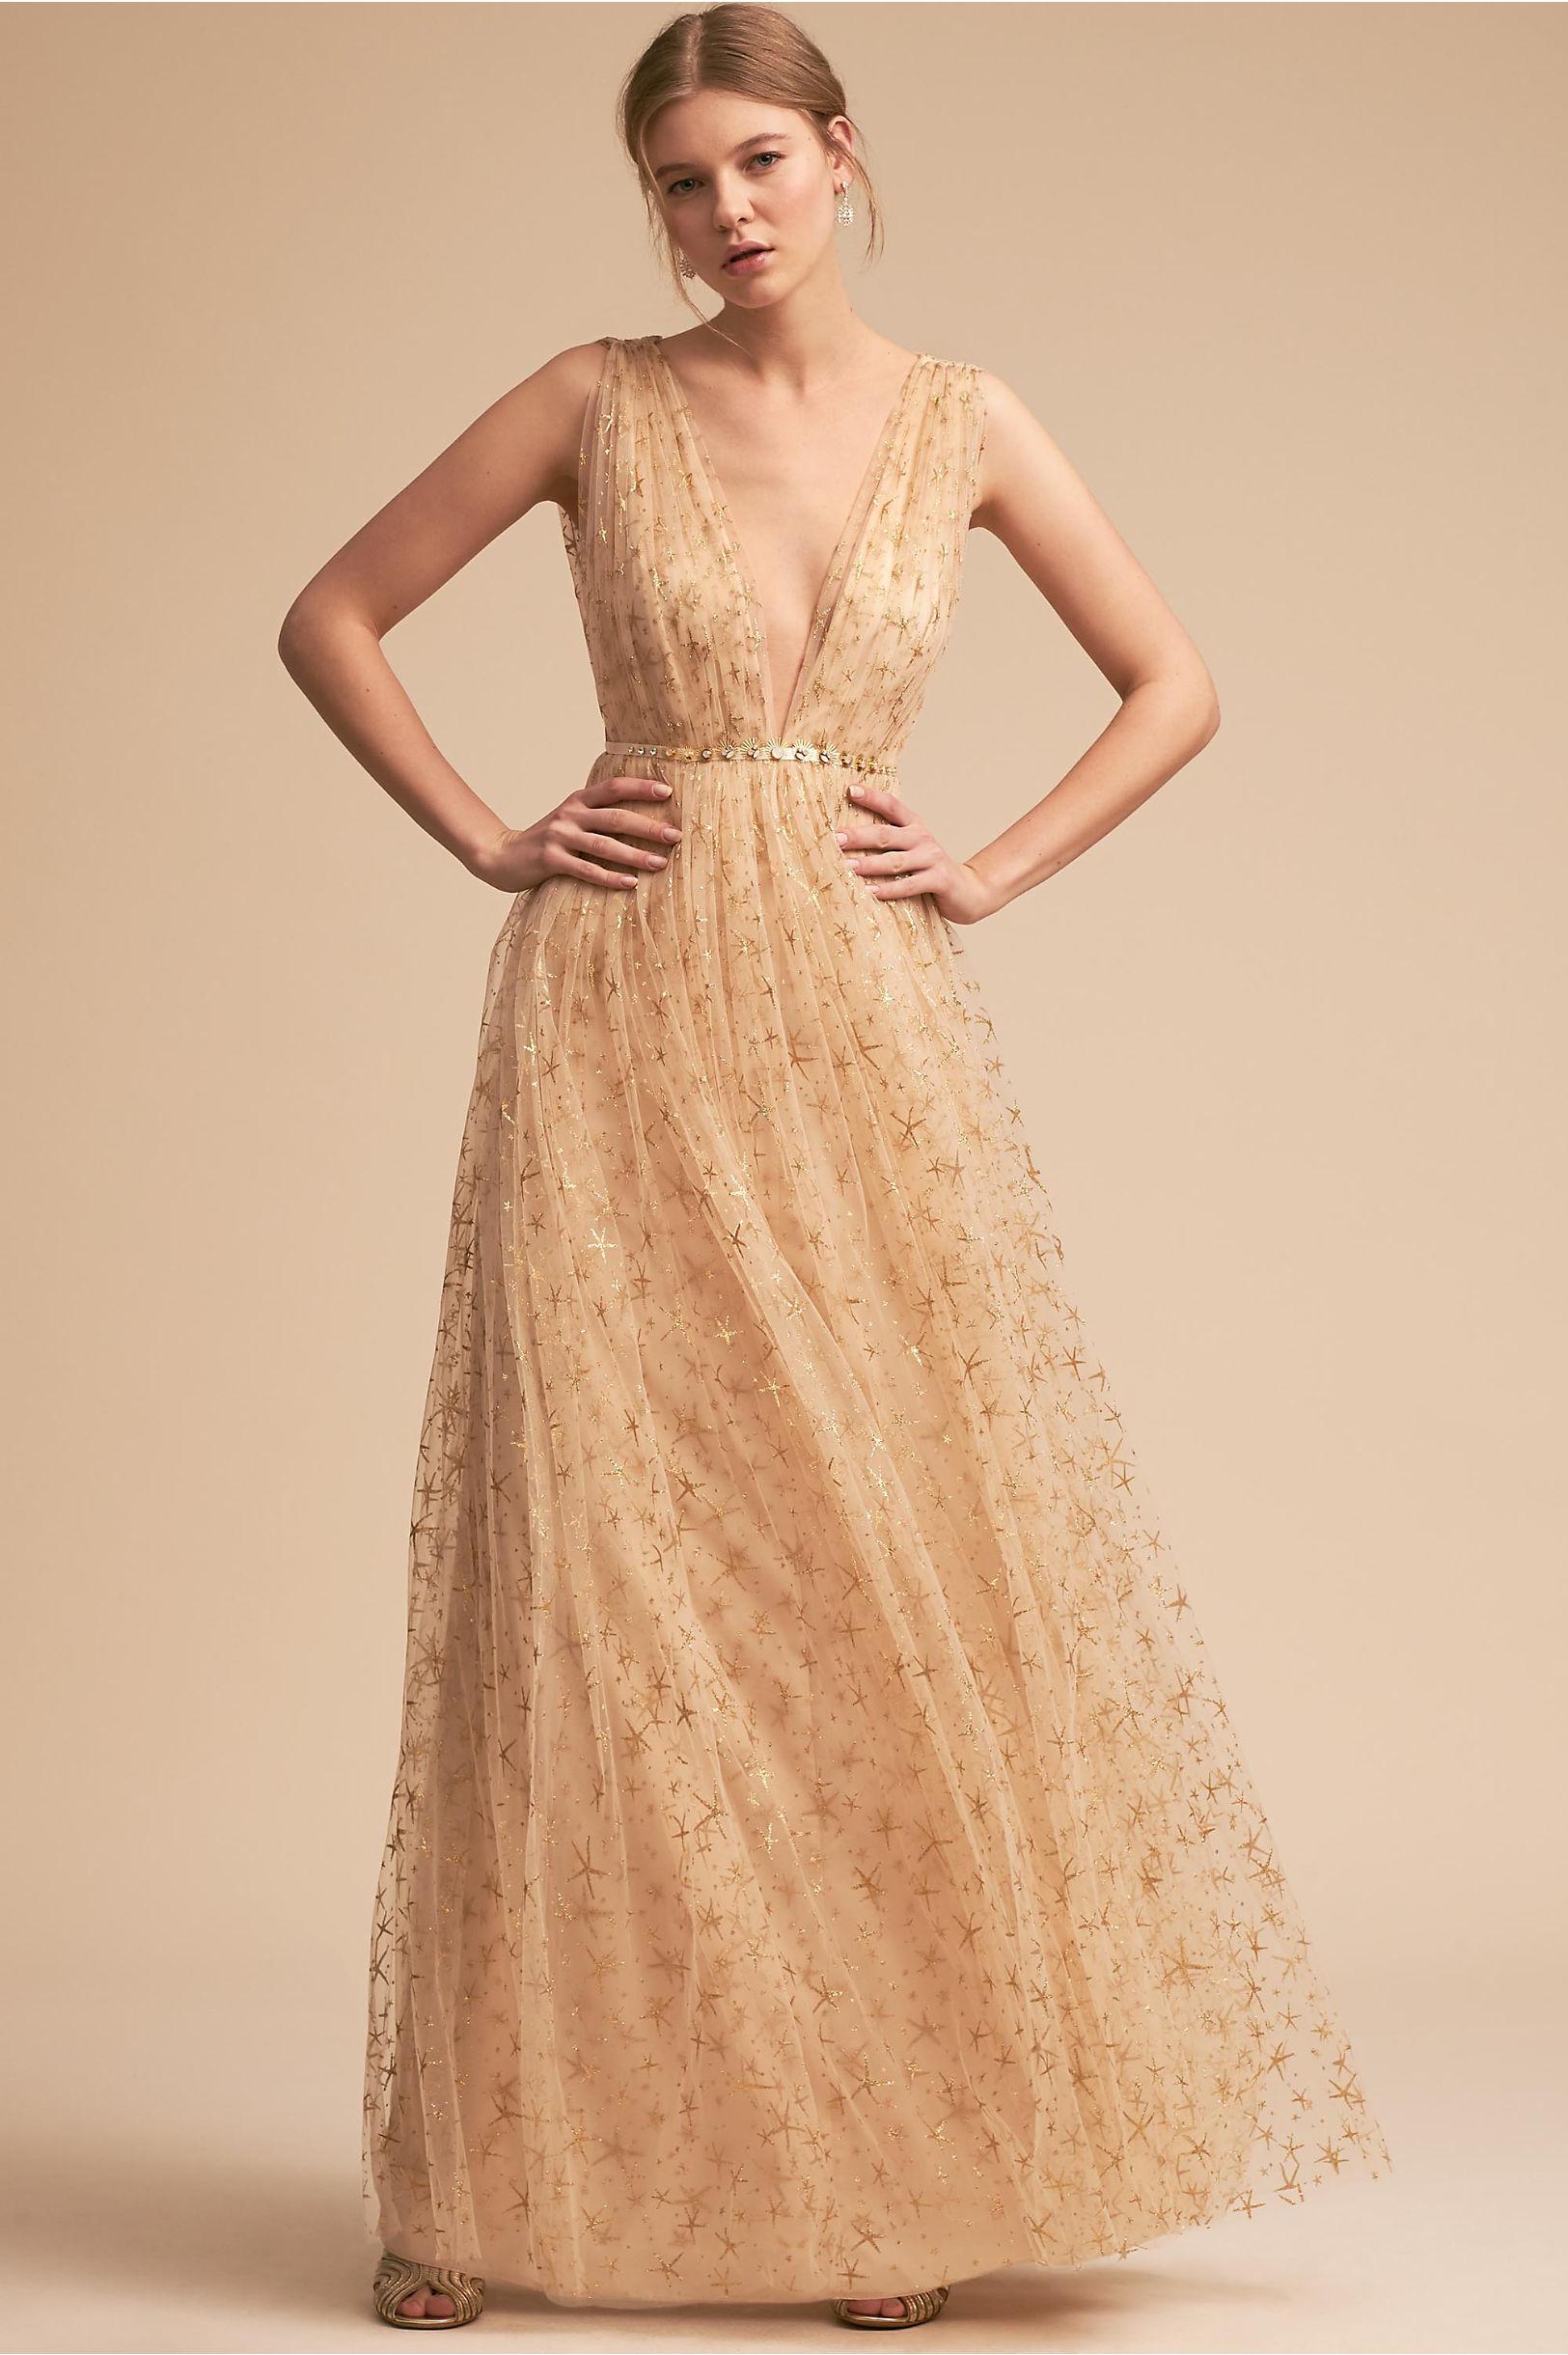 Flicker Dress in Sale | BHLDN